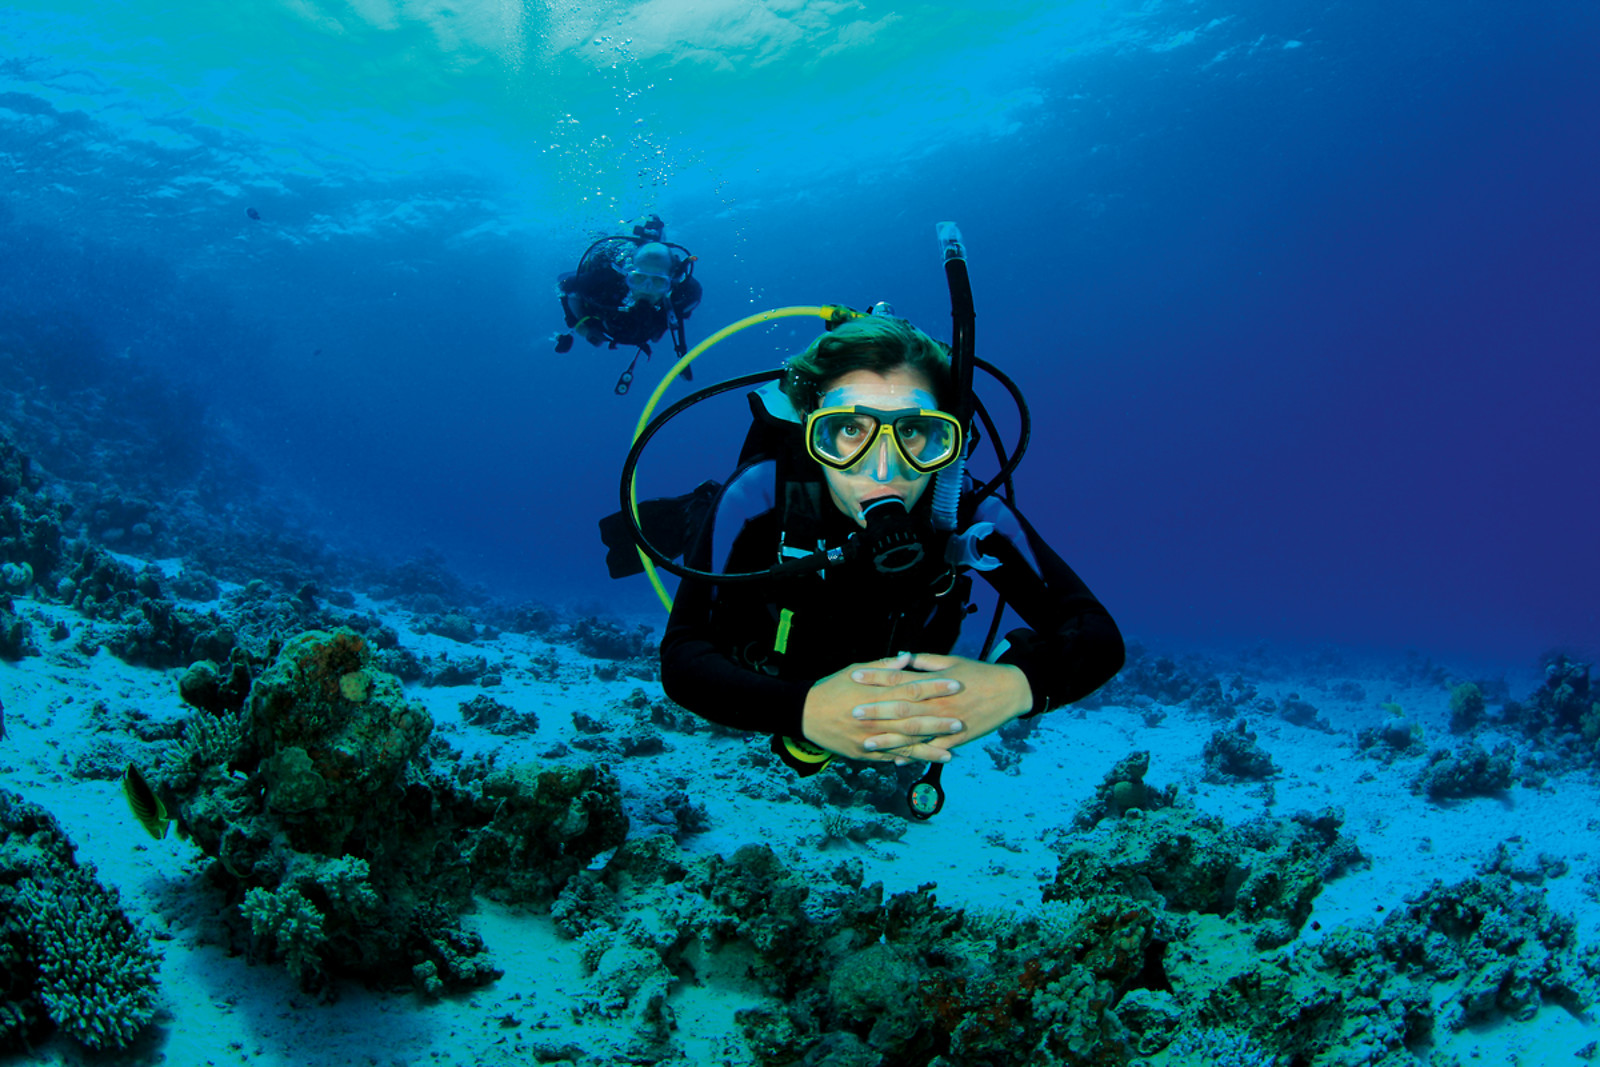 Super Baptême de plongée - Diving Calvi - Calvi (2B) - Wonderbox CZ27